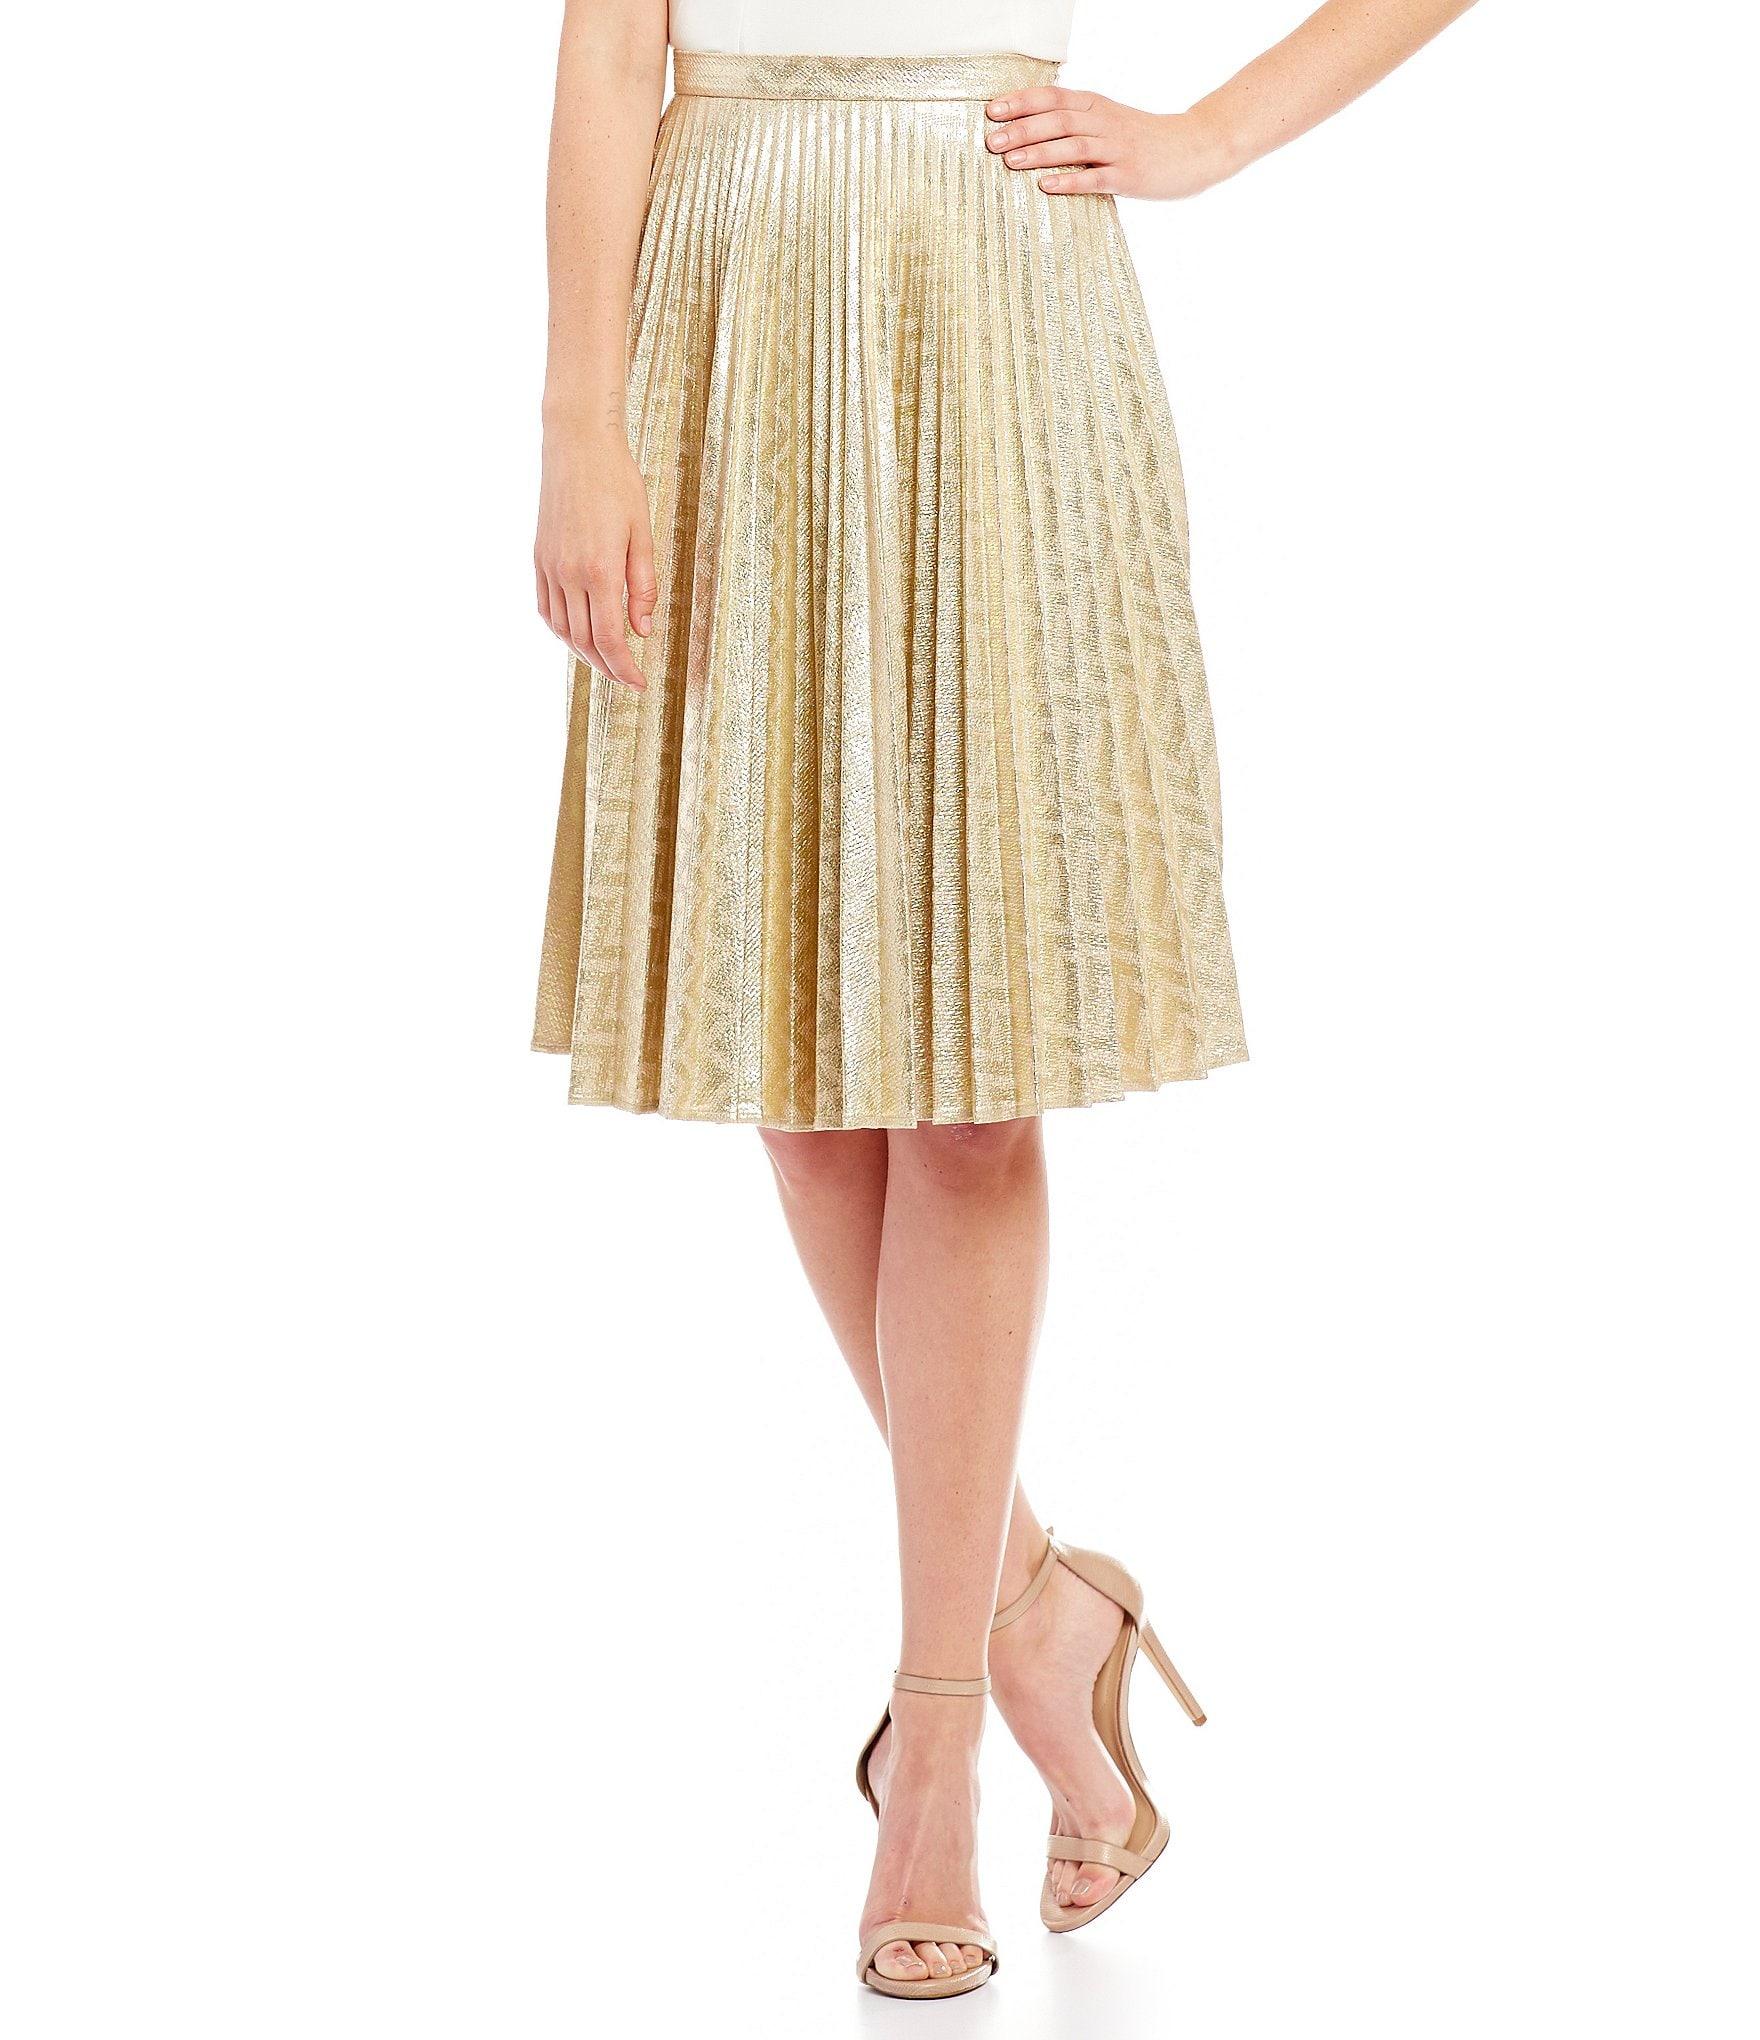 franco pleated metallic skirt dillards